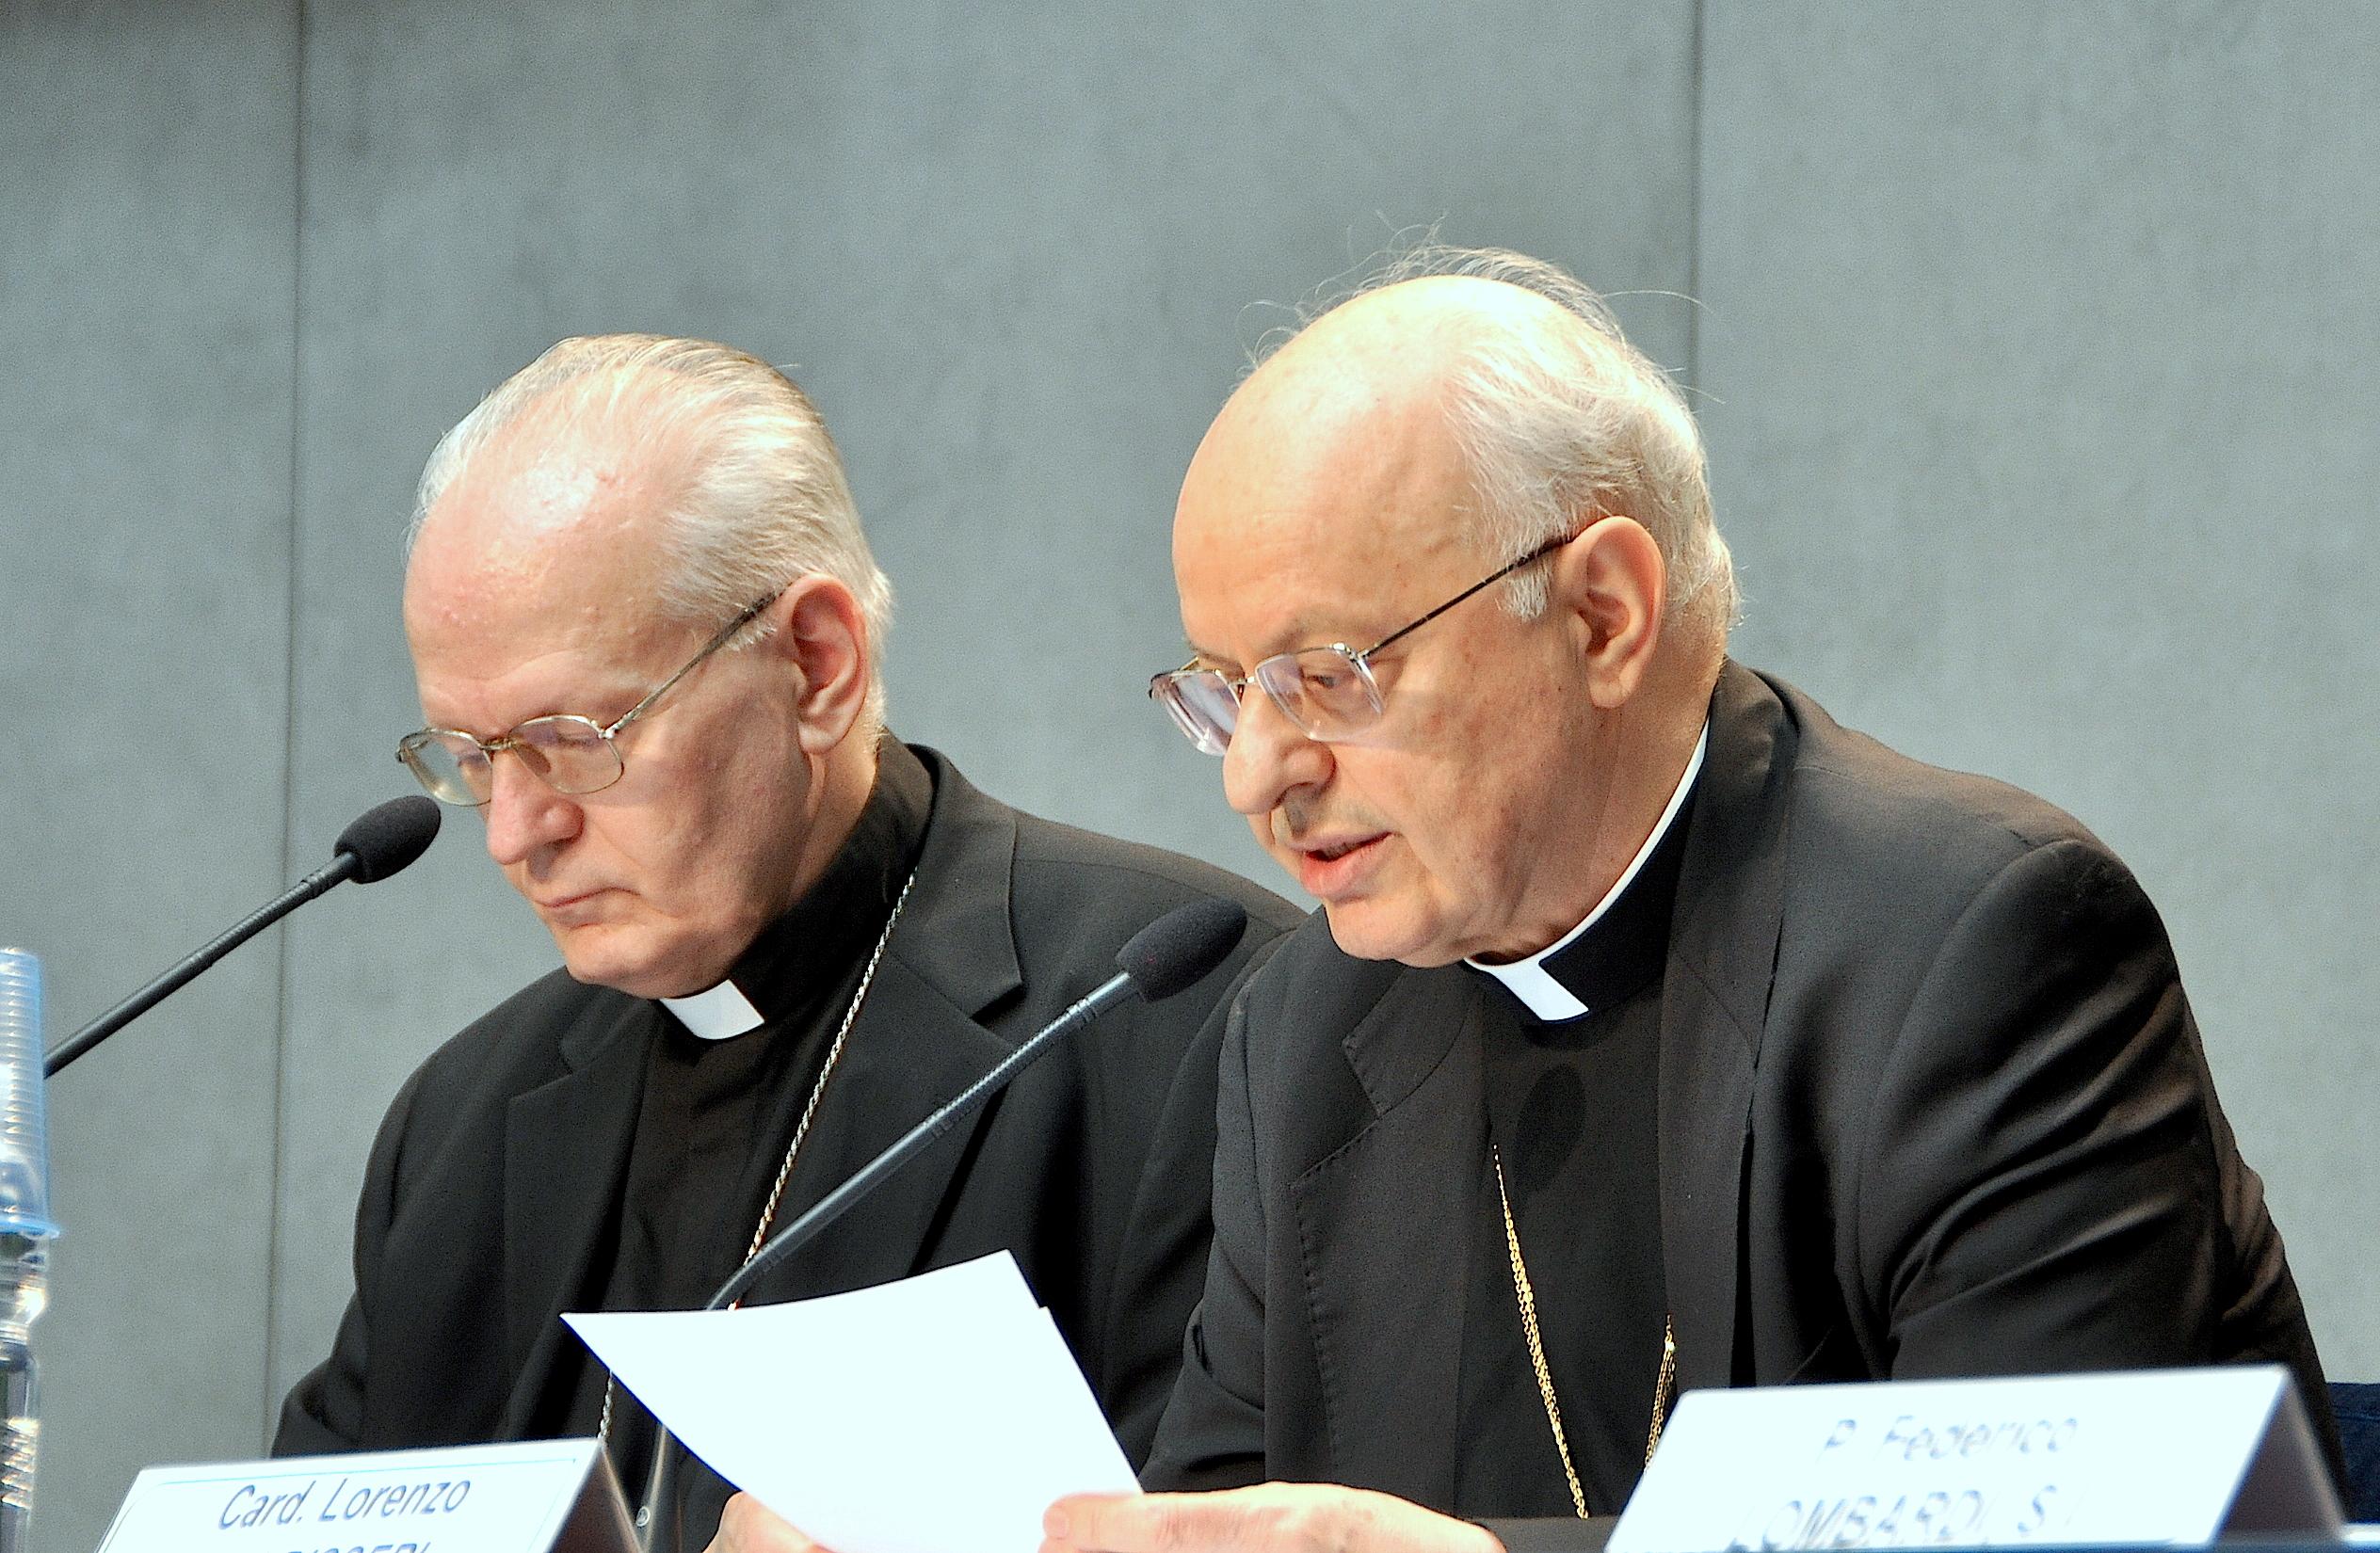 Cardinals Baldiserri and Erdó during the presentation of instrumentum laboris in the vatican press room - 23 June 2015